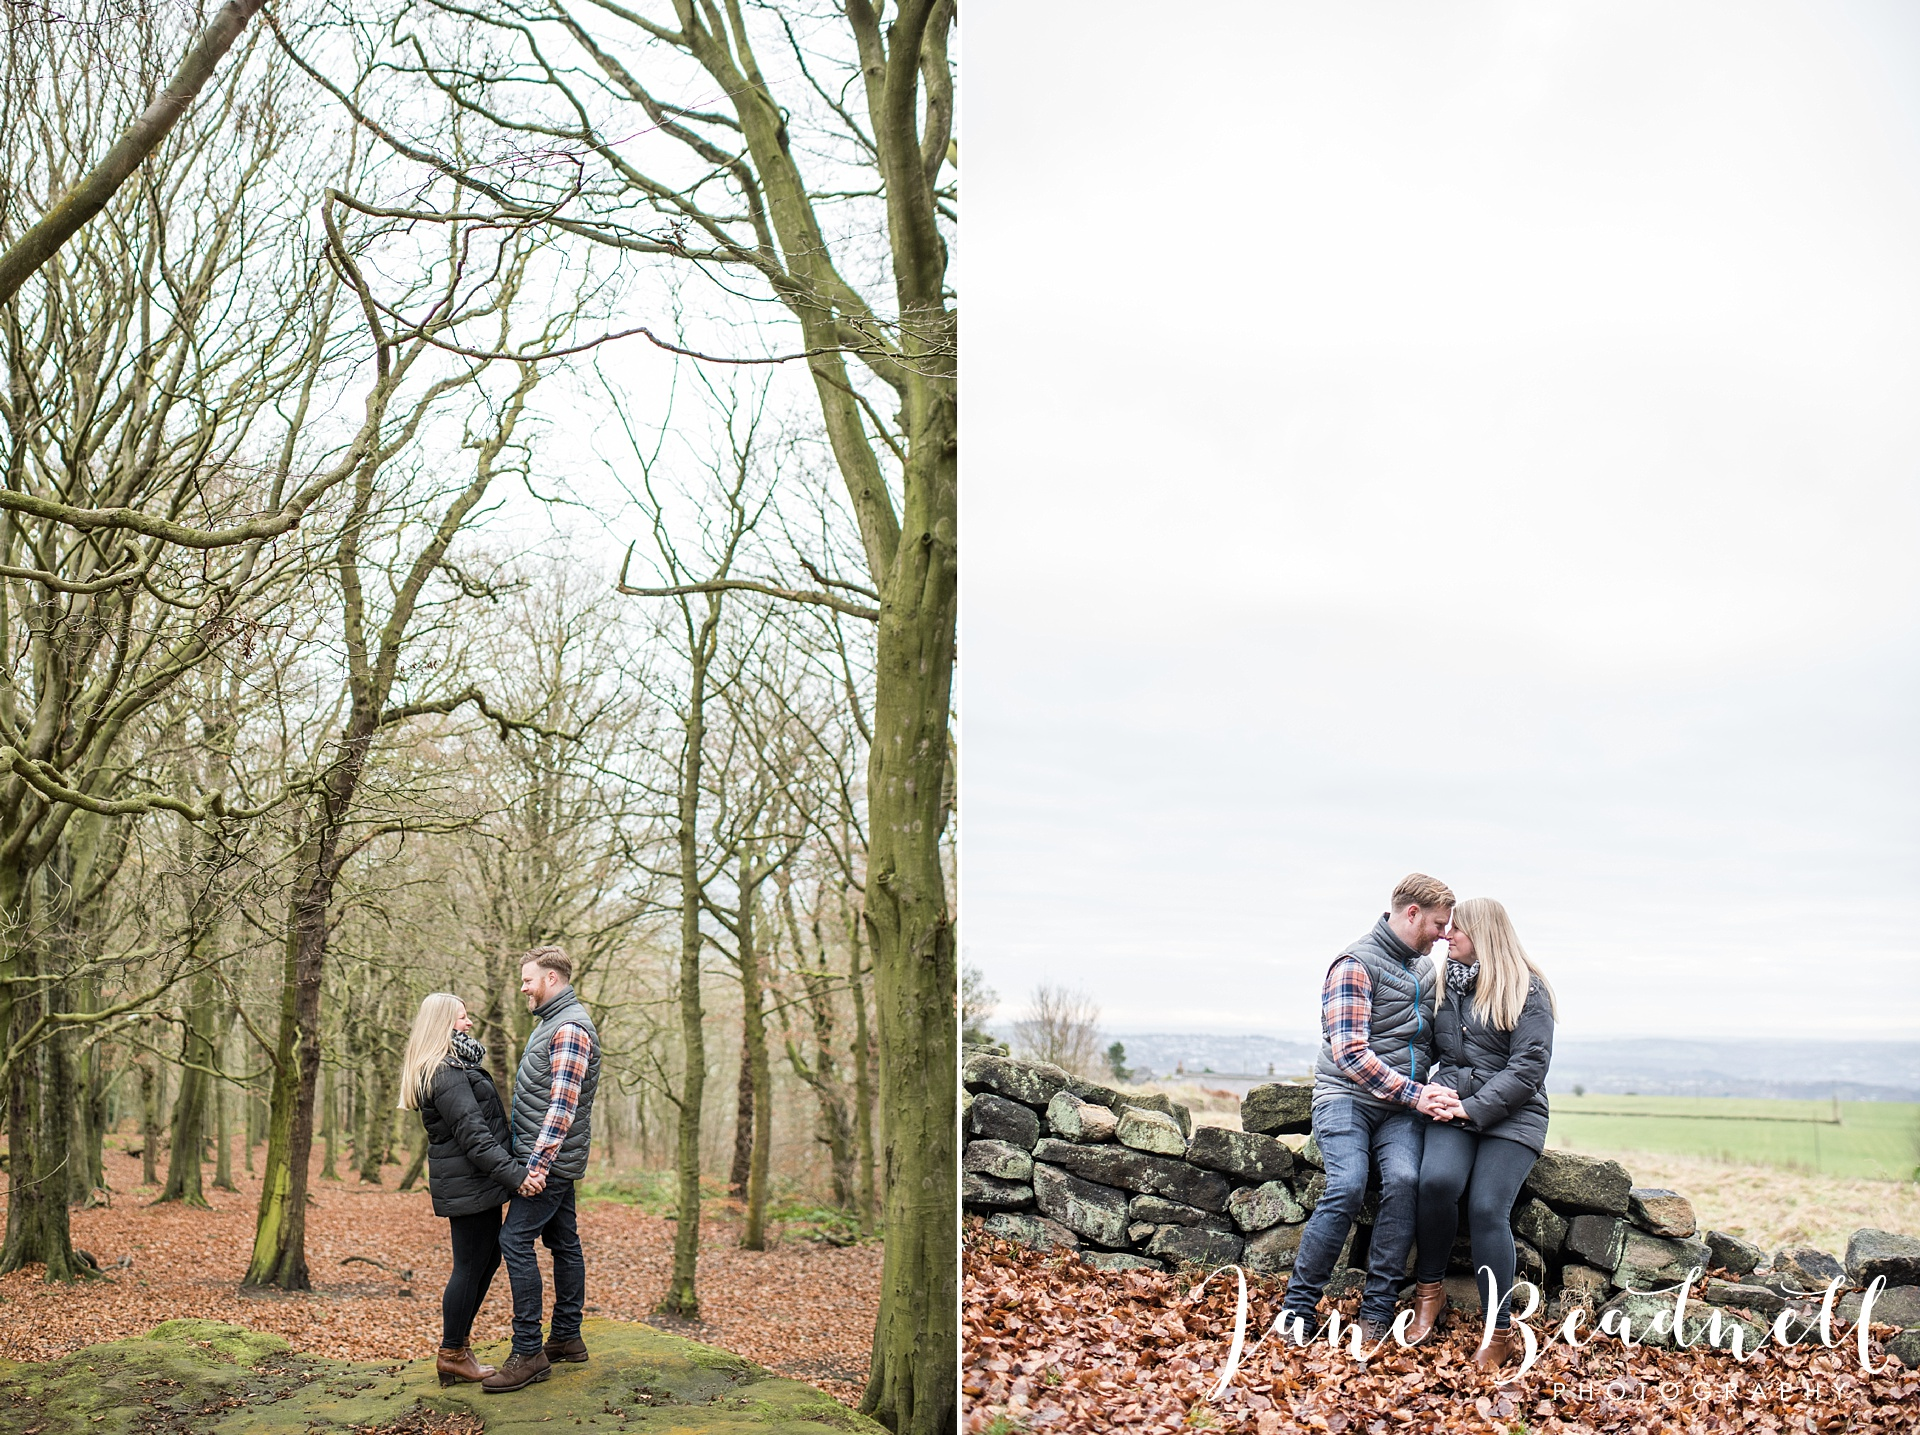 yorkshire-wedding-photographer-jane-beadnell-photography-uk-and-destination-wedding-photographer-engagement-shoot_0029